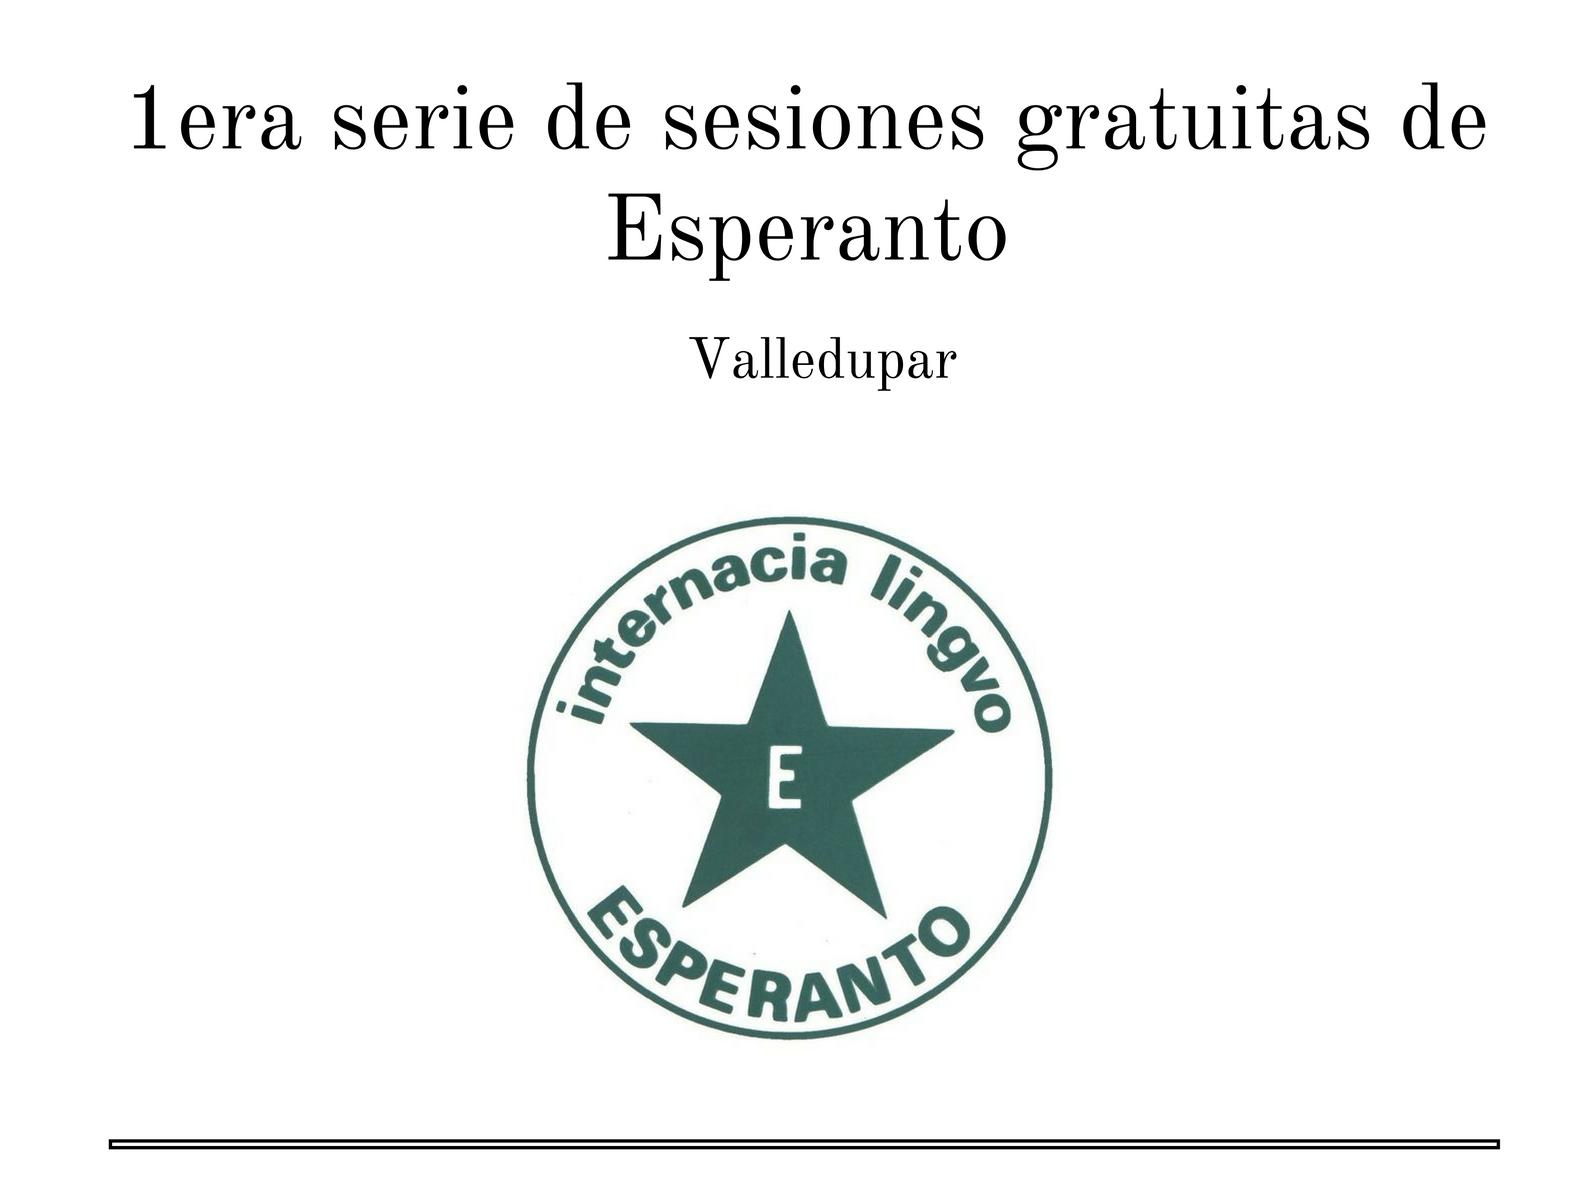 Esperanto en Valledupar 1